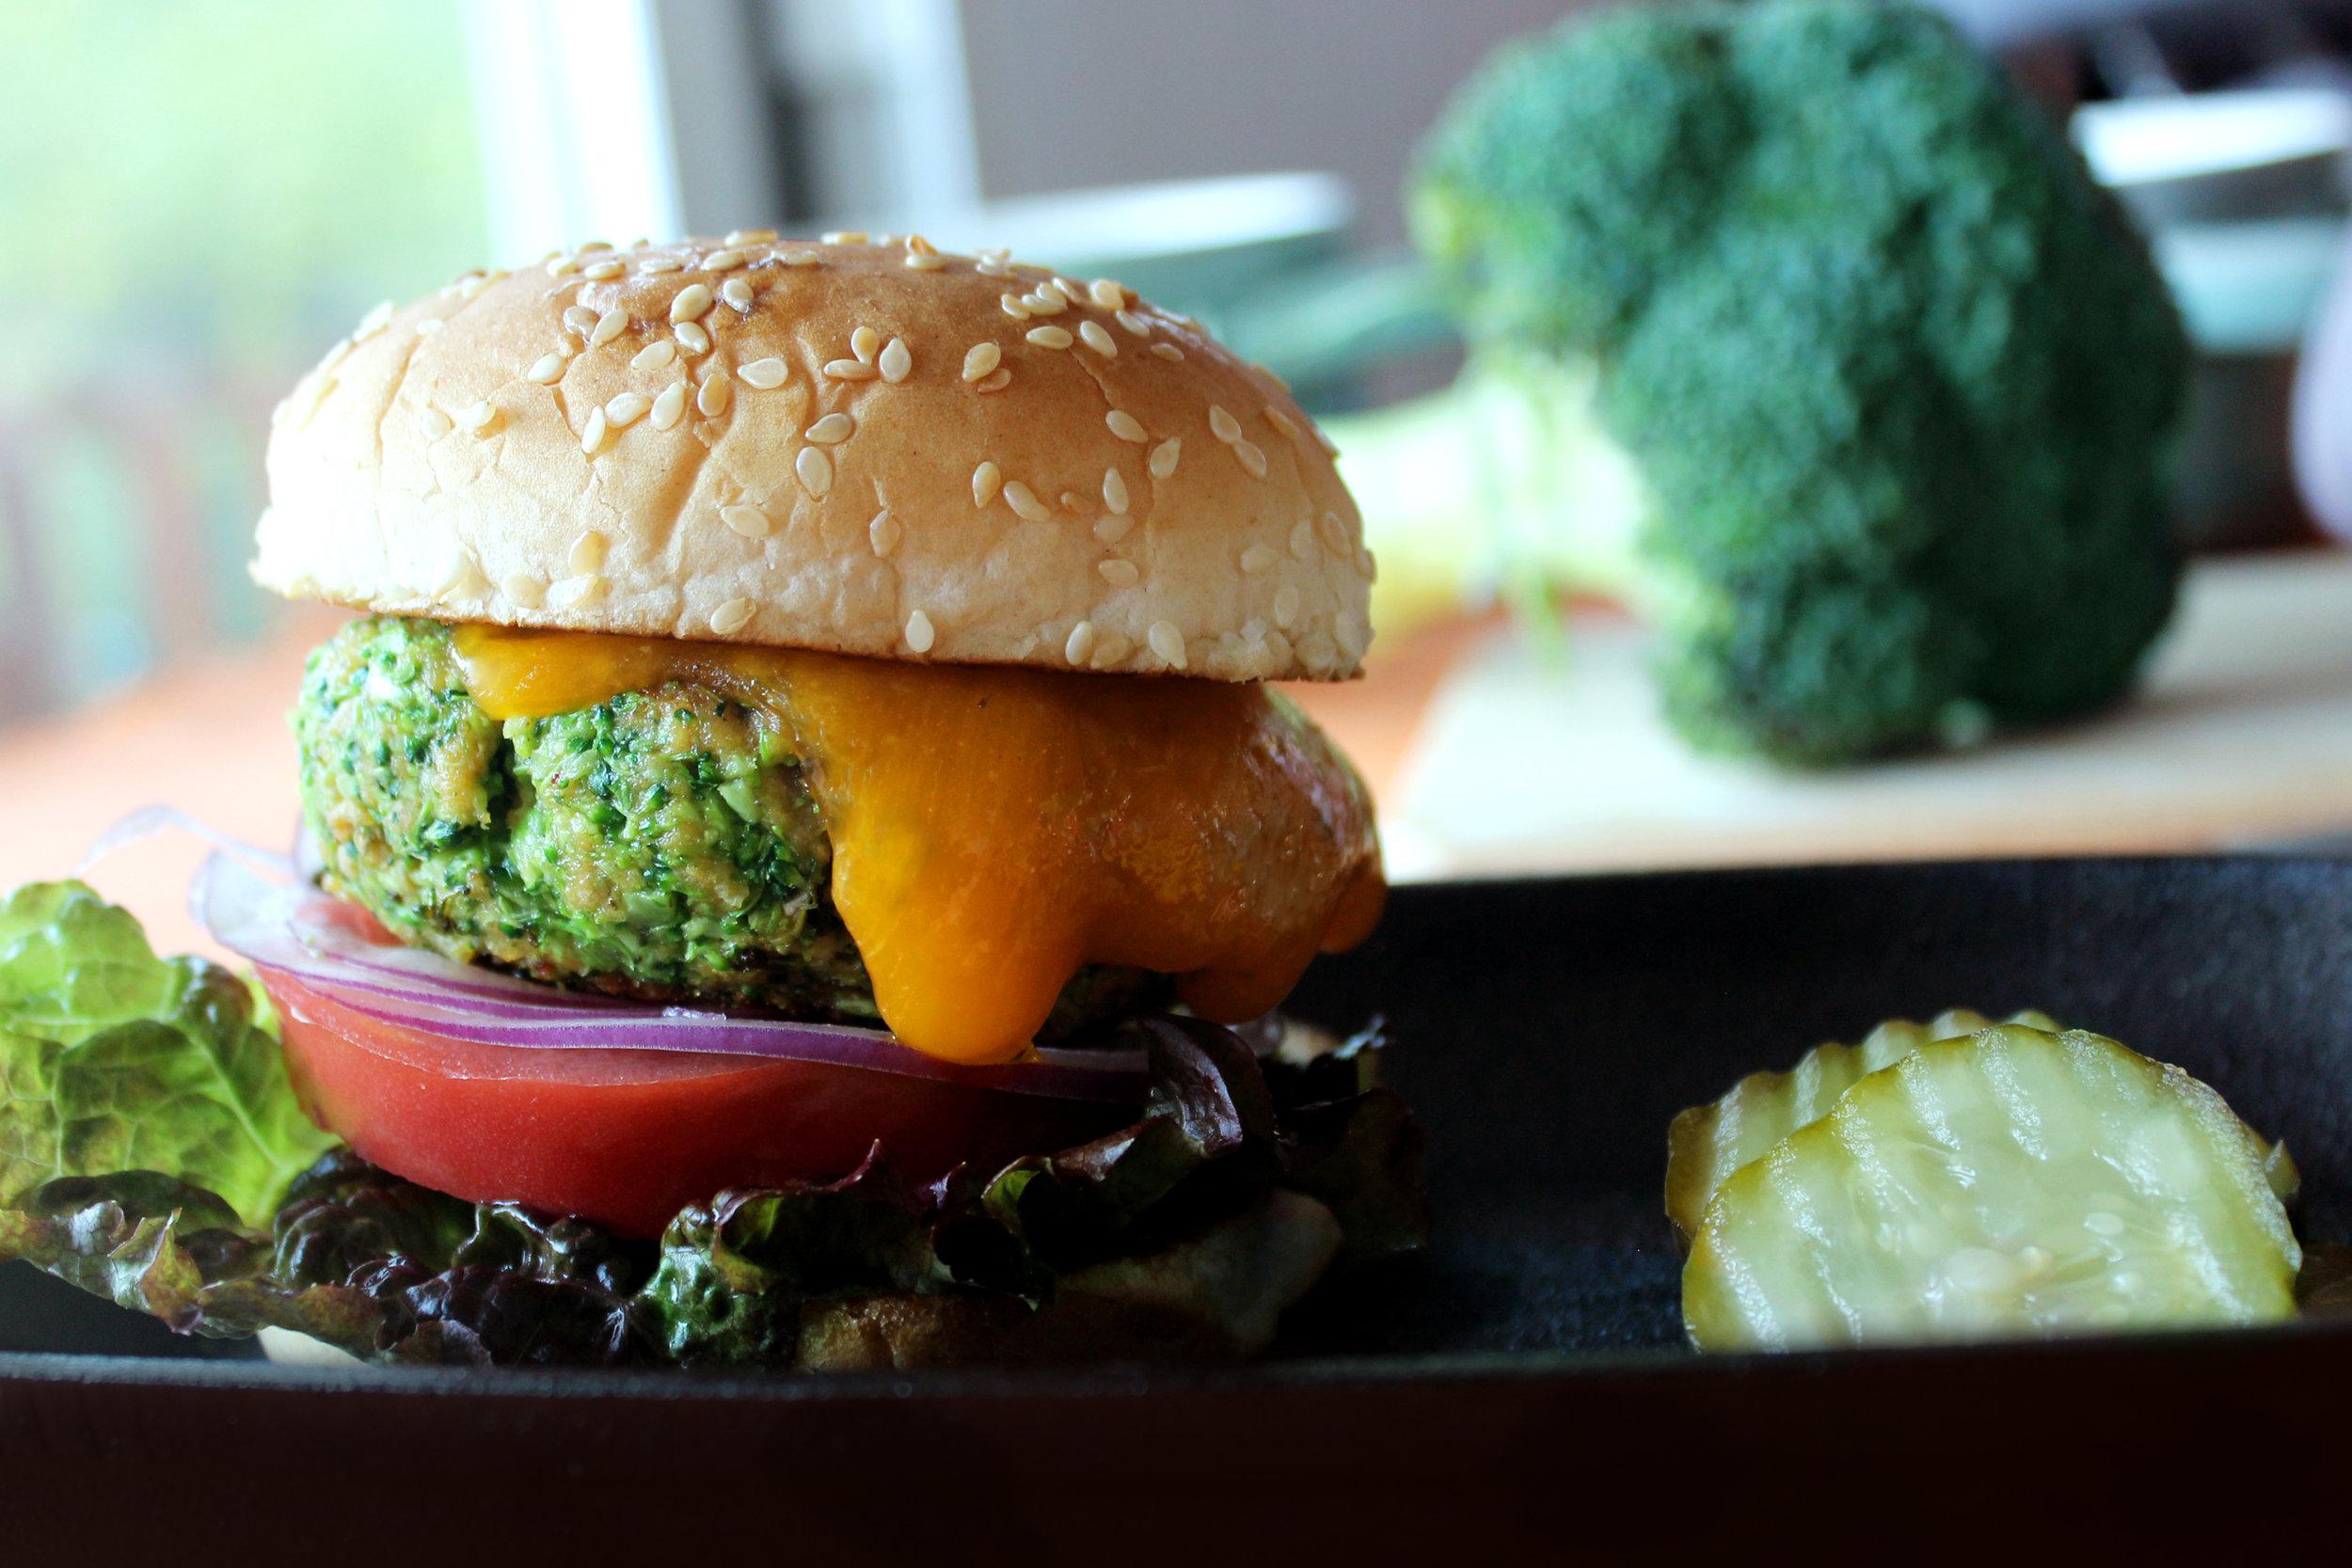 'Adda Veggie Broccoli Burger